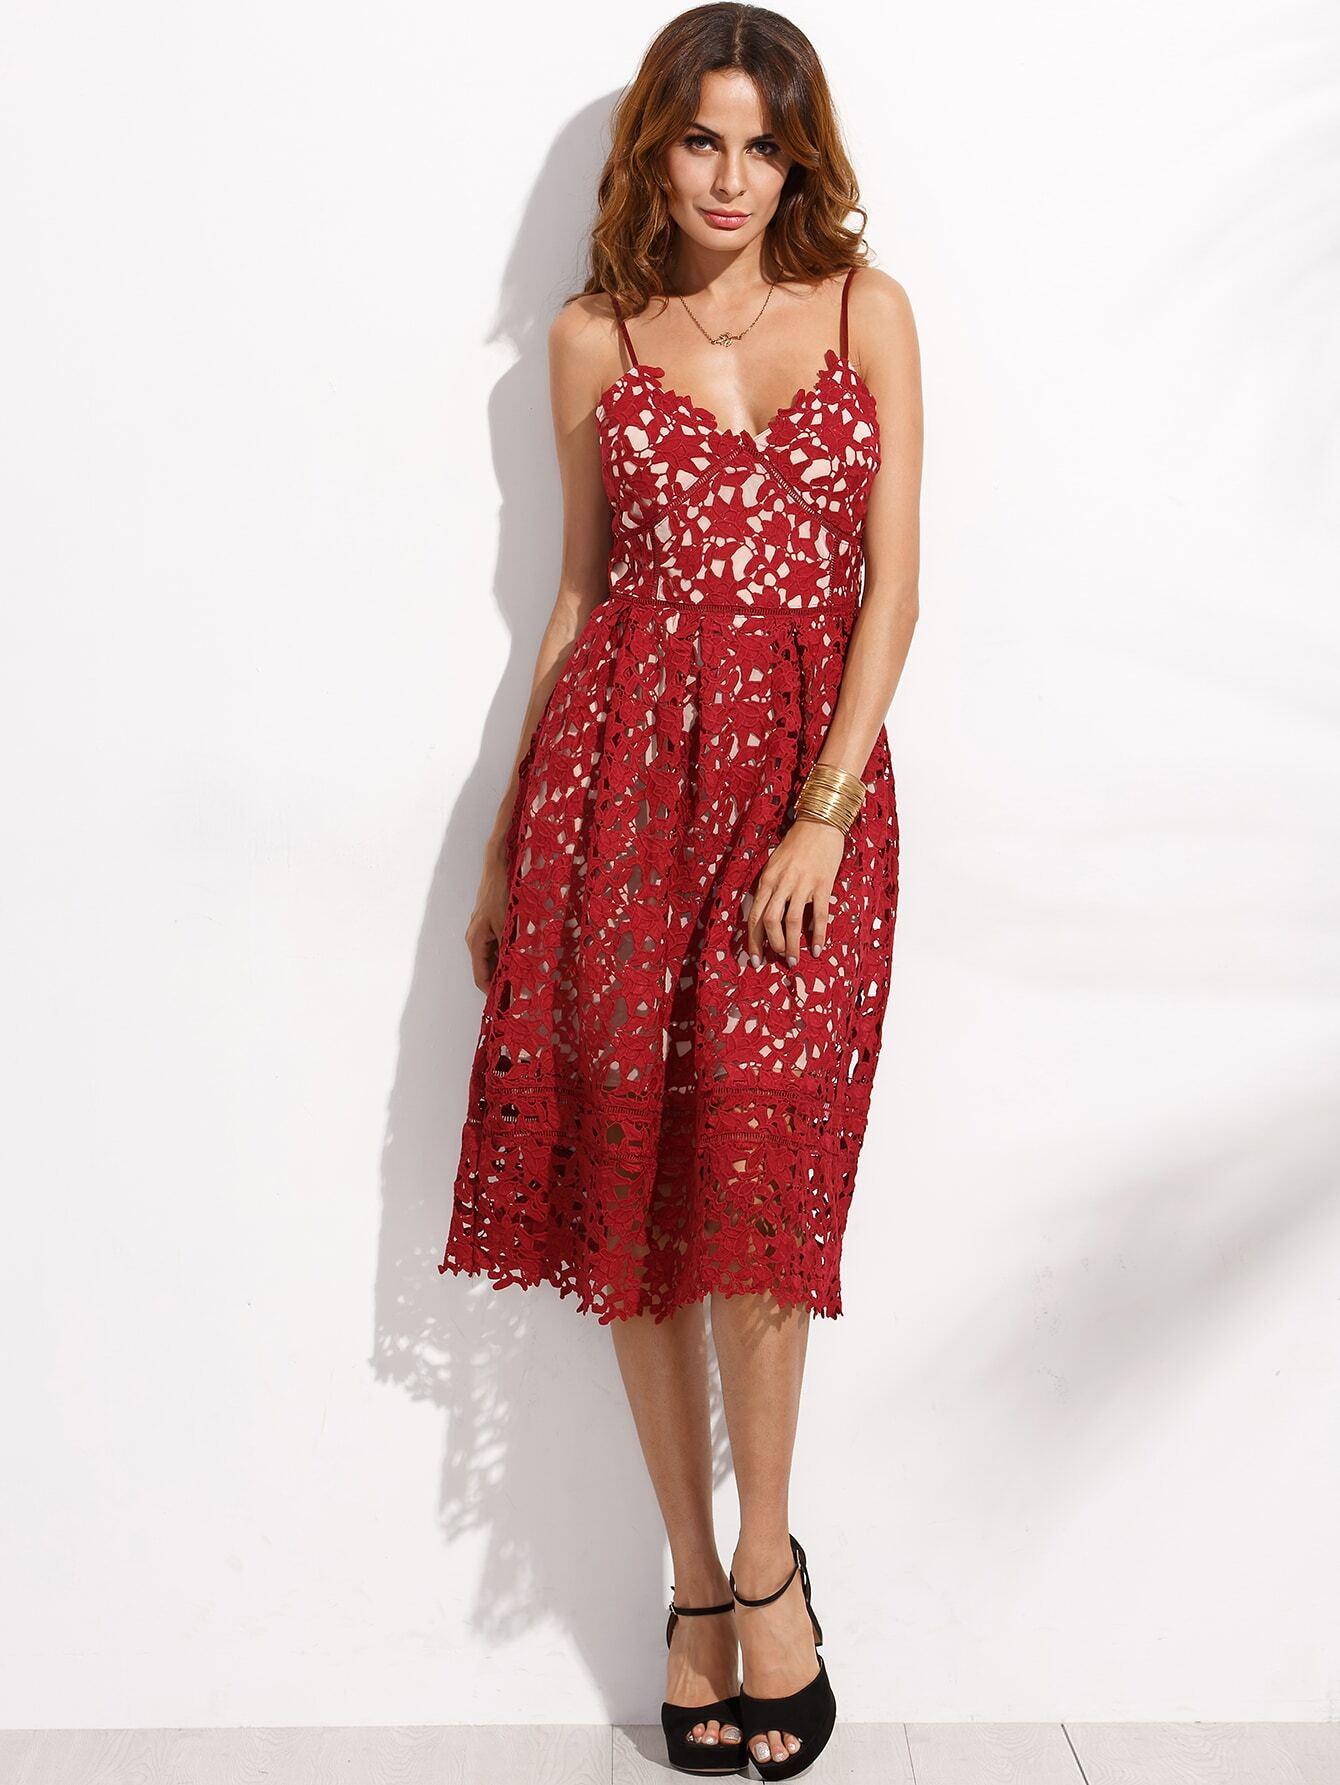 Кружевное платье картинки